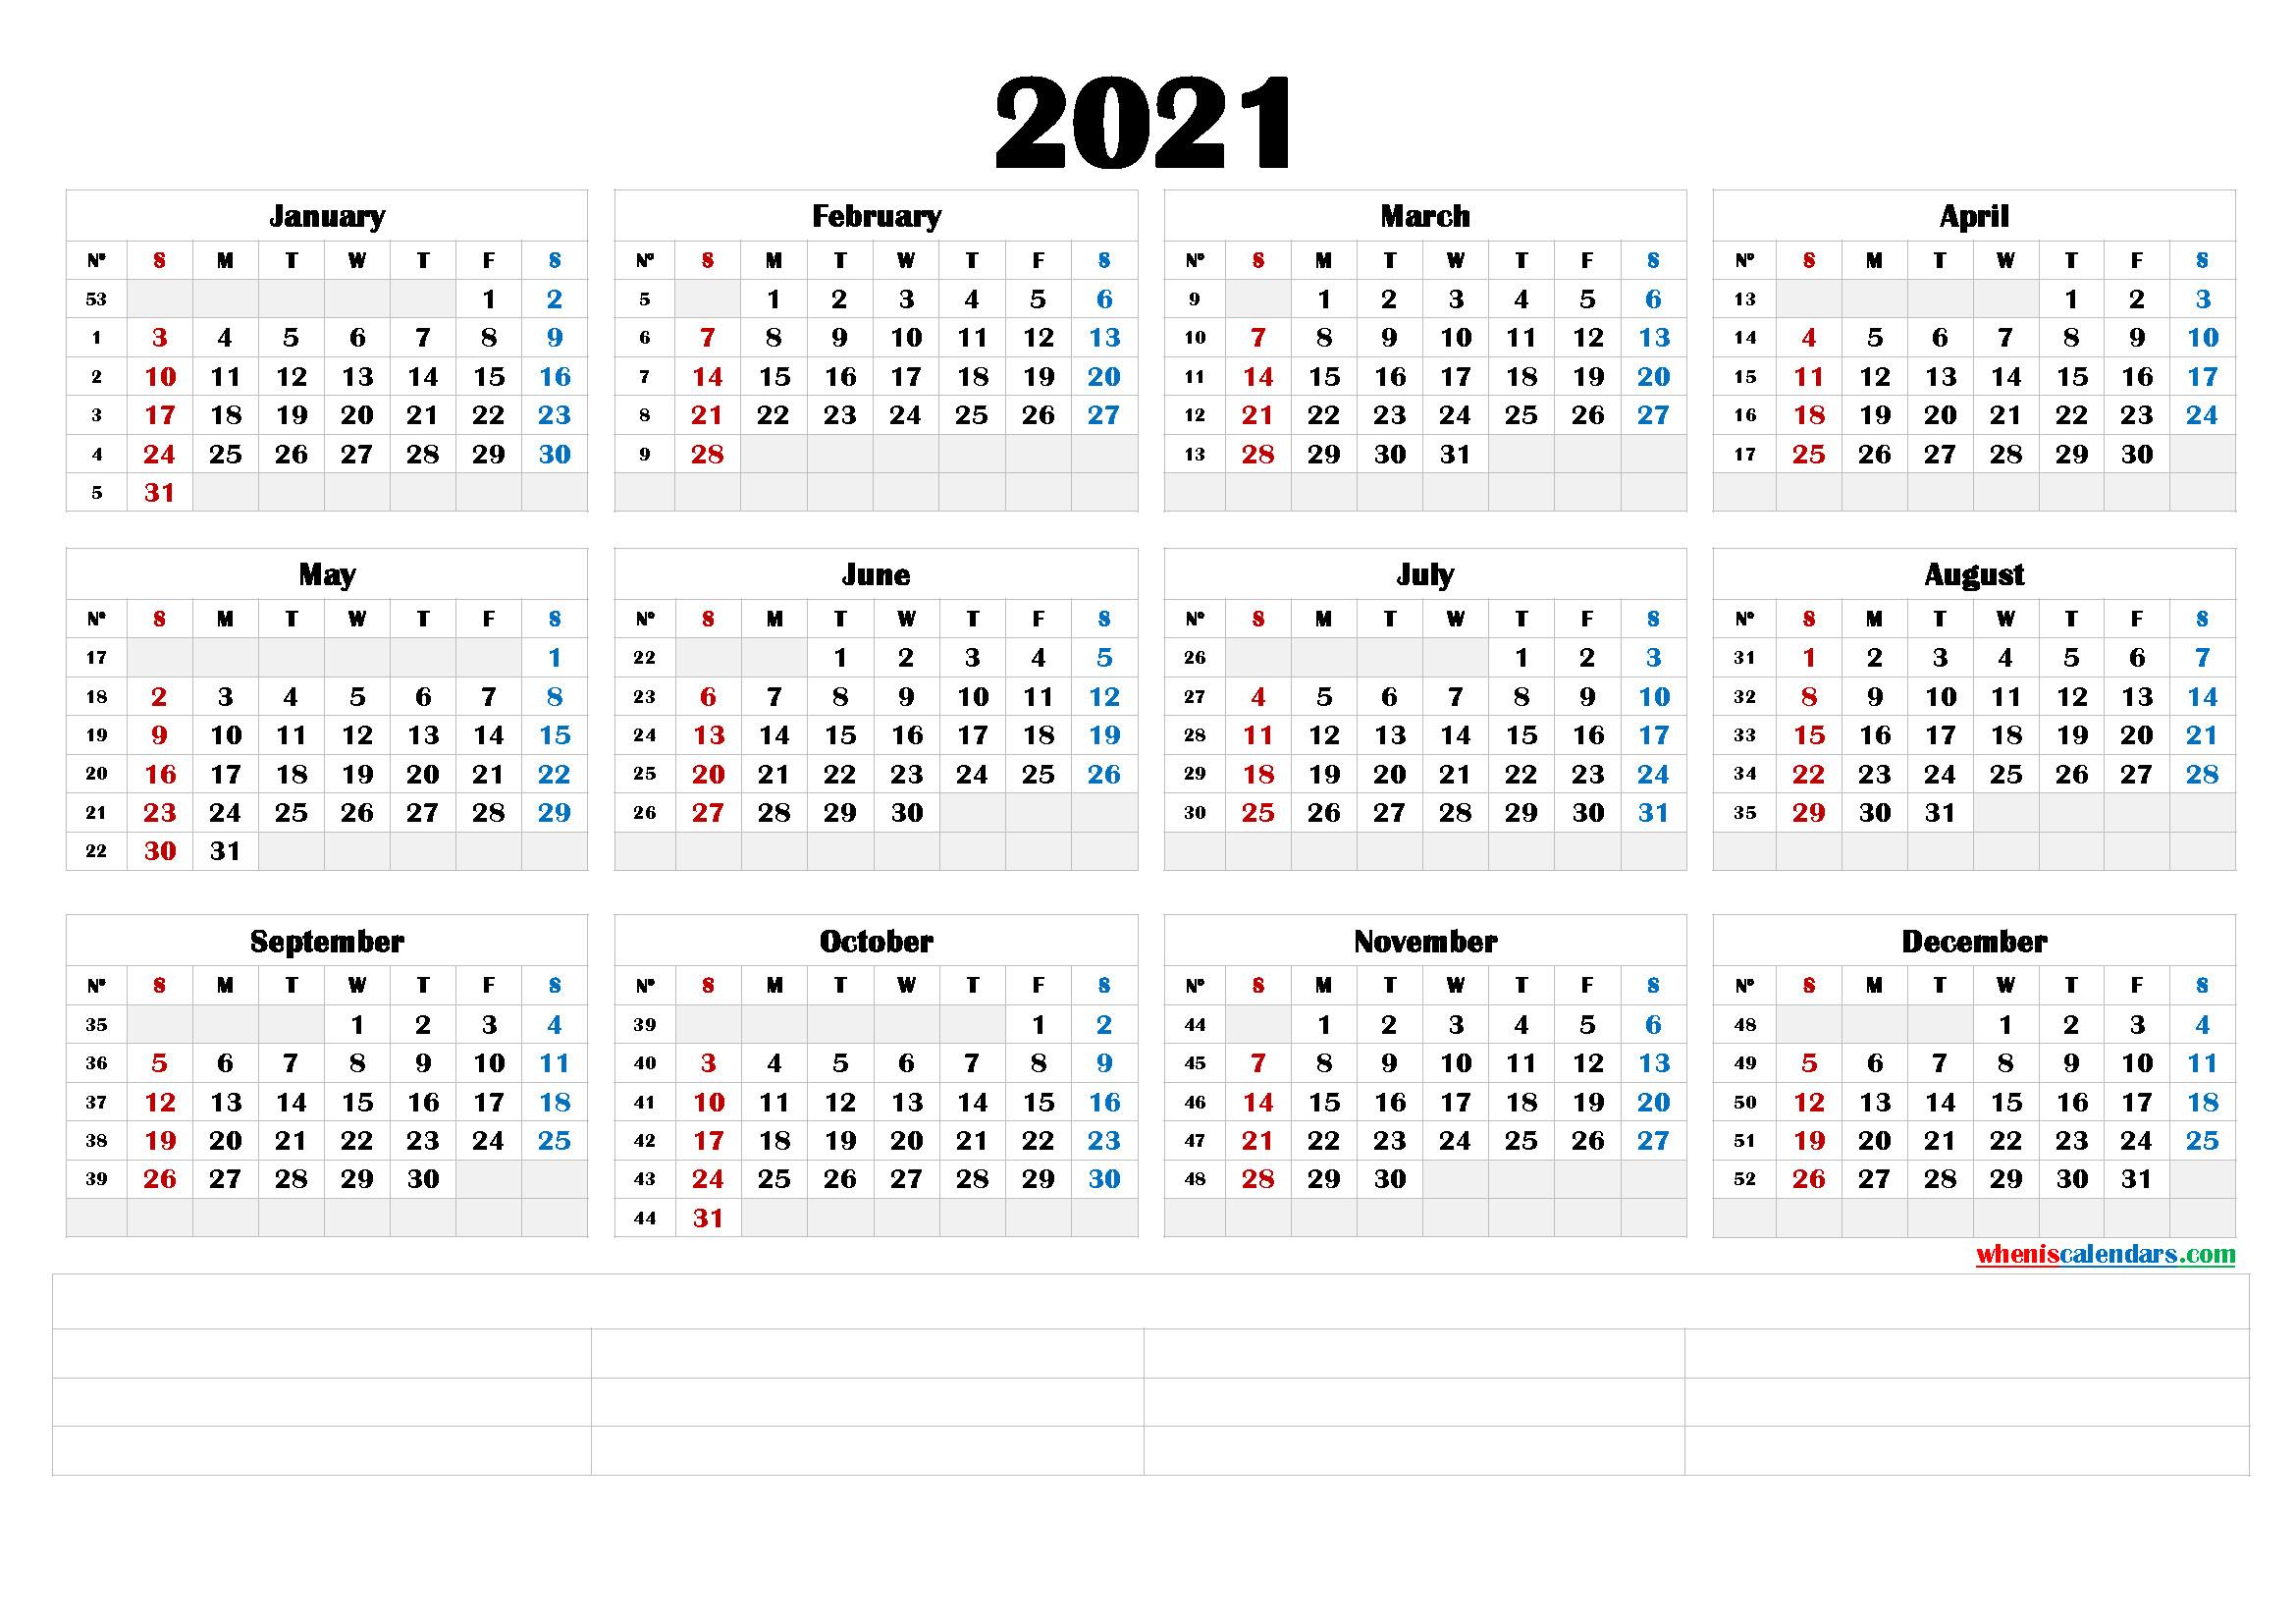 2021 Printable Yearly Calendar With Week Numbers (6 Templates)-2021 Absentee Calendar